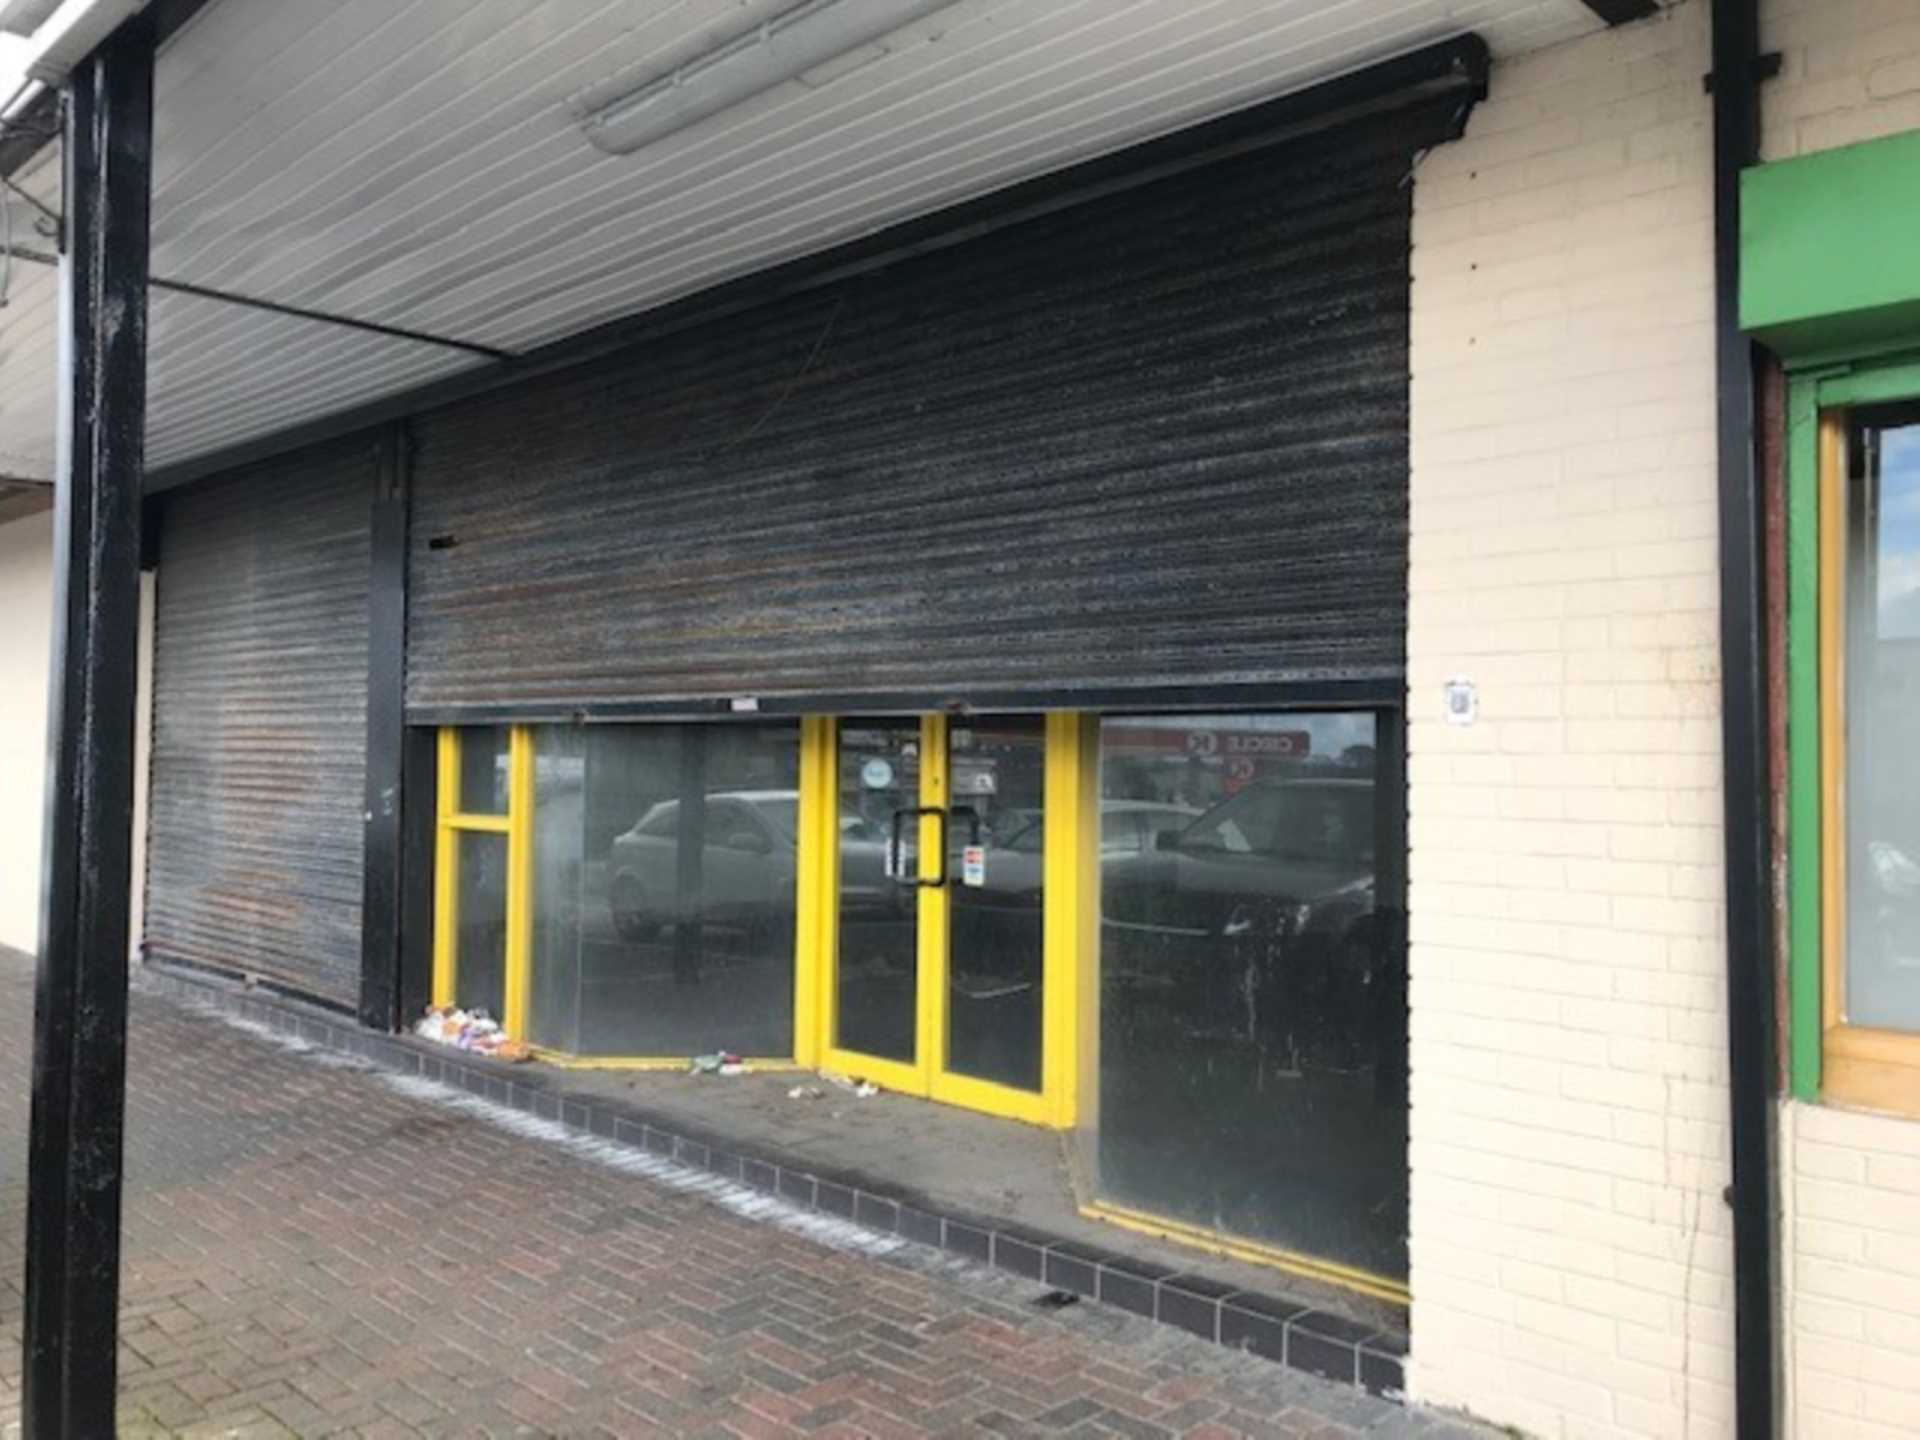 Xtra Vision Unit, Roxboro Shopping Centre, Co. Limerick